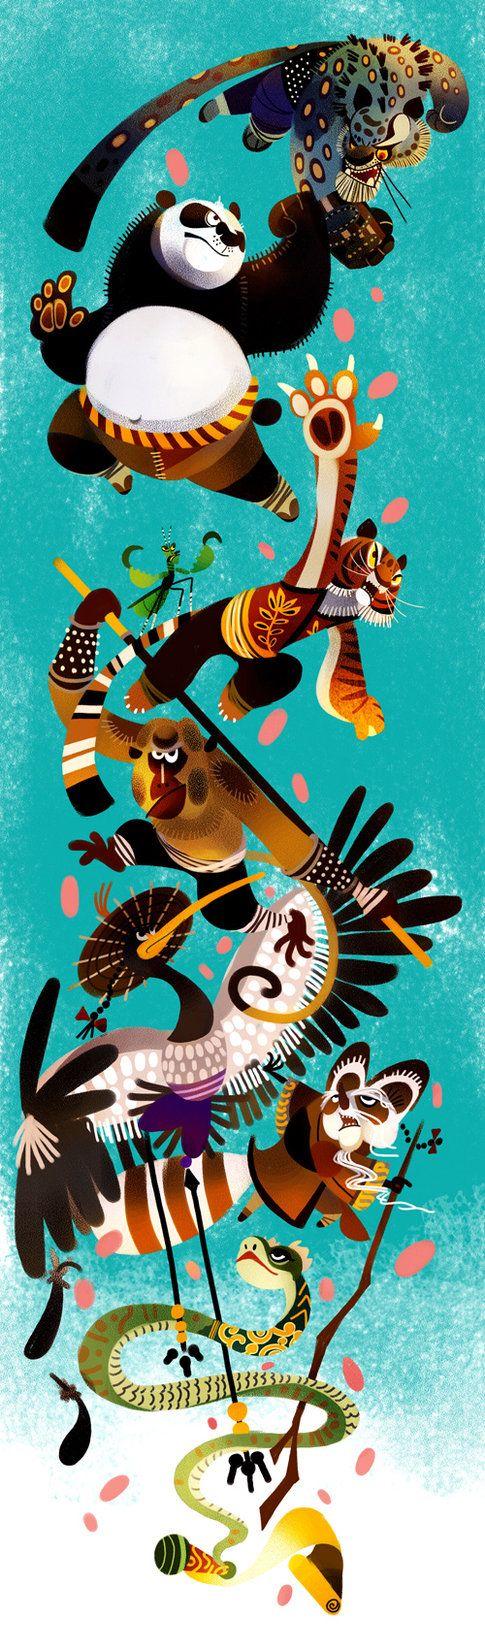 Animal is Kung Fu fighting by ~galgard on deviantART